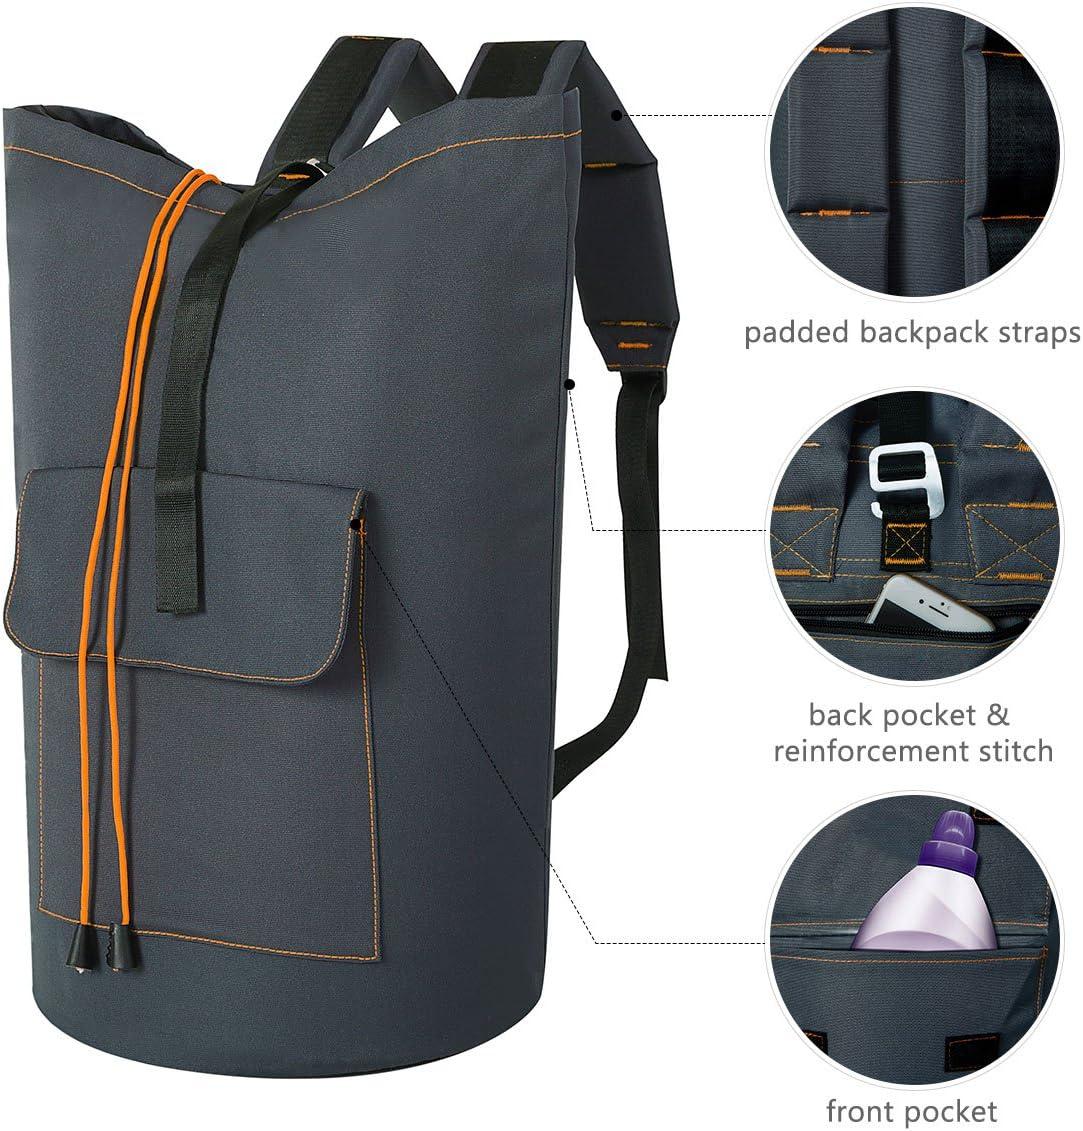 ZERO JET LAG 70L Extra Large Laundry Bag Heavy Duty Backpack with Straps Pockets Hanging Laundry Hamper College Essentials Storage Basket Storage Bag Dorm Home(Dark Grey,XL)